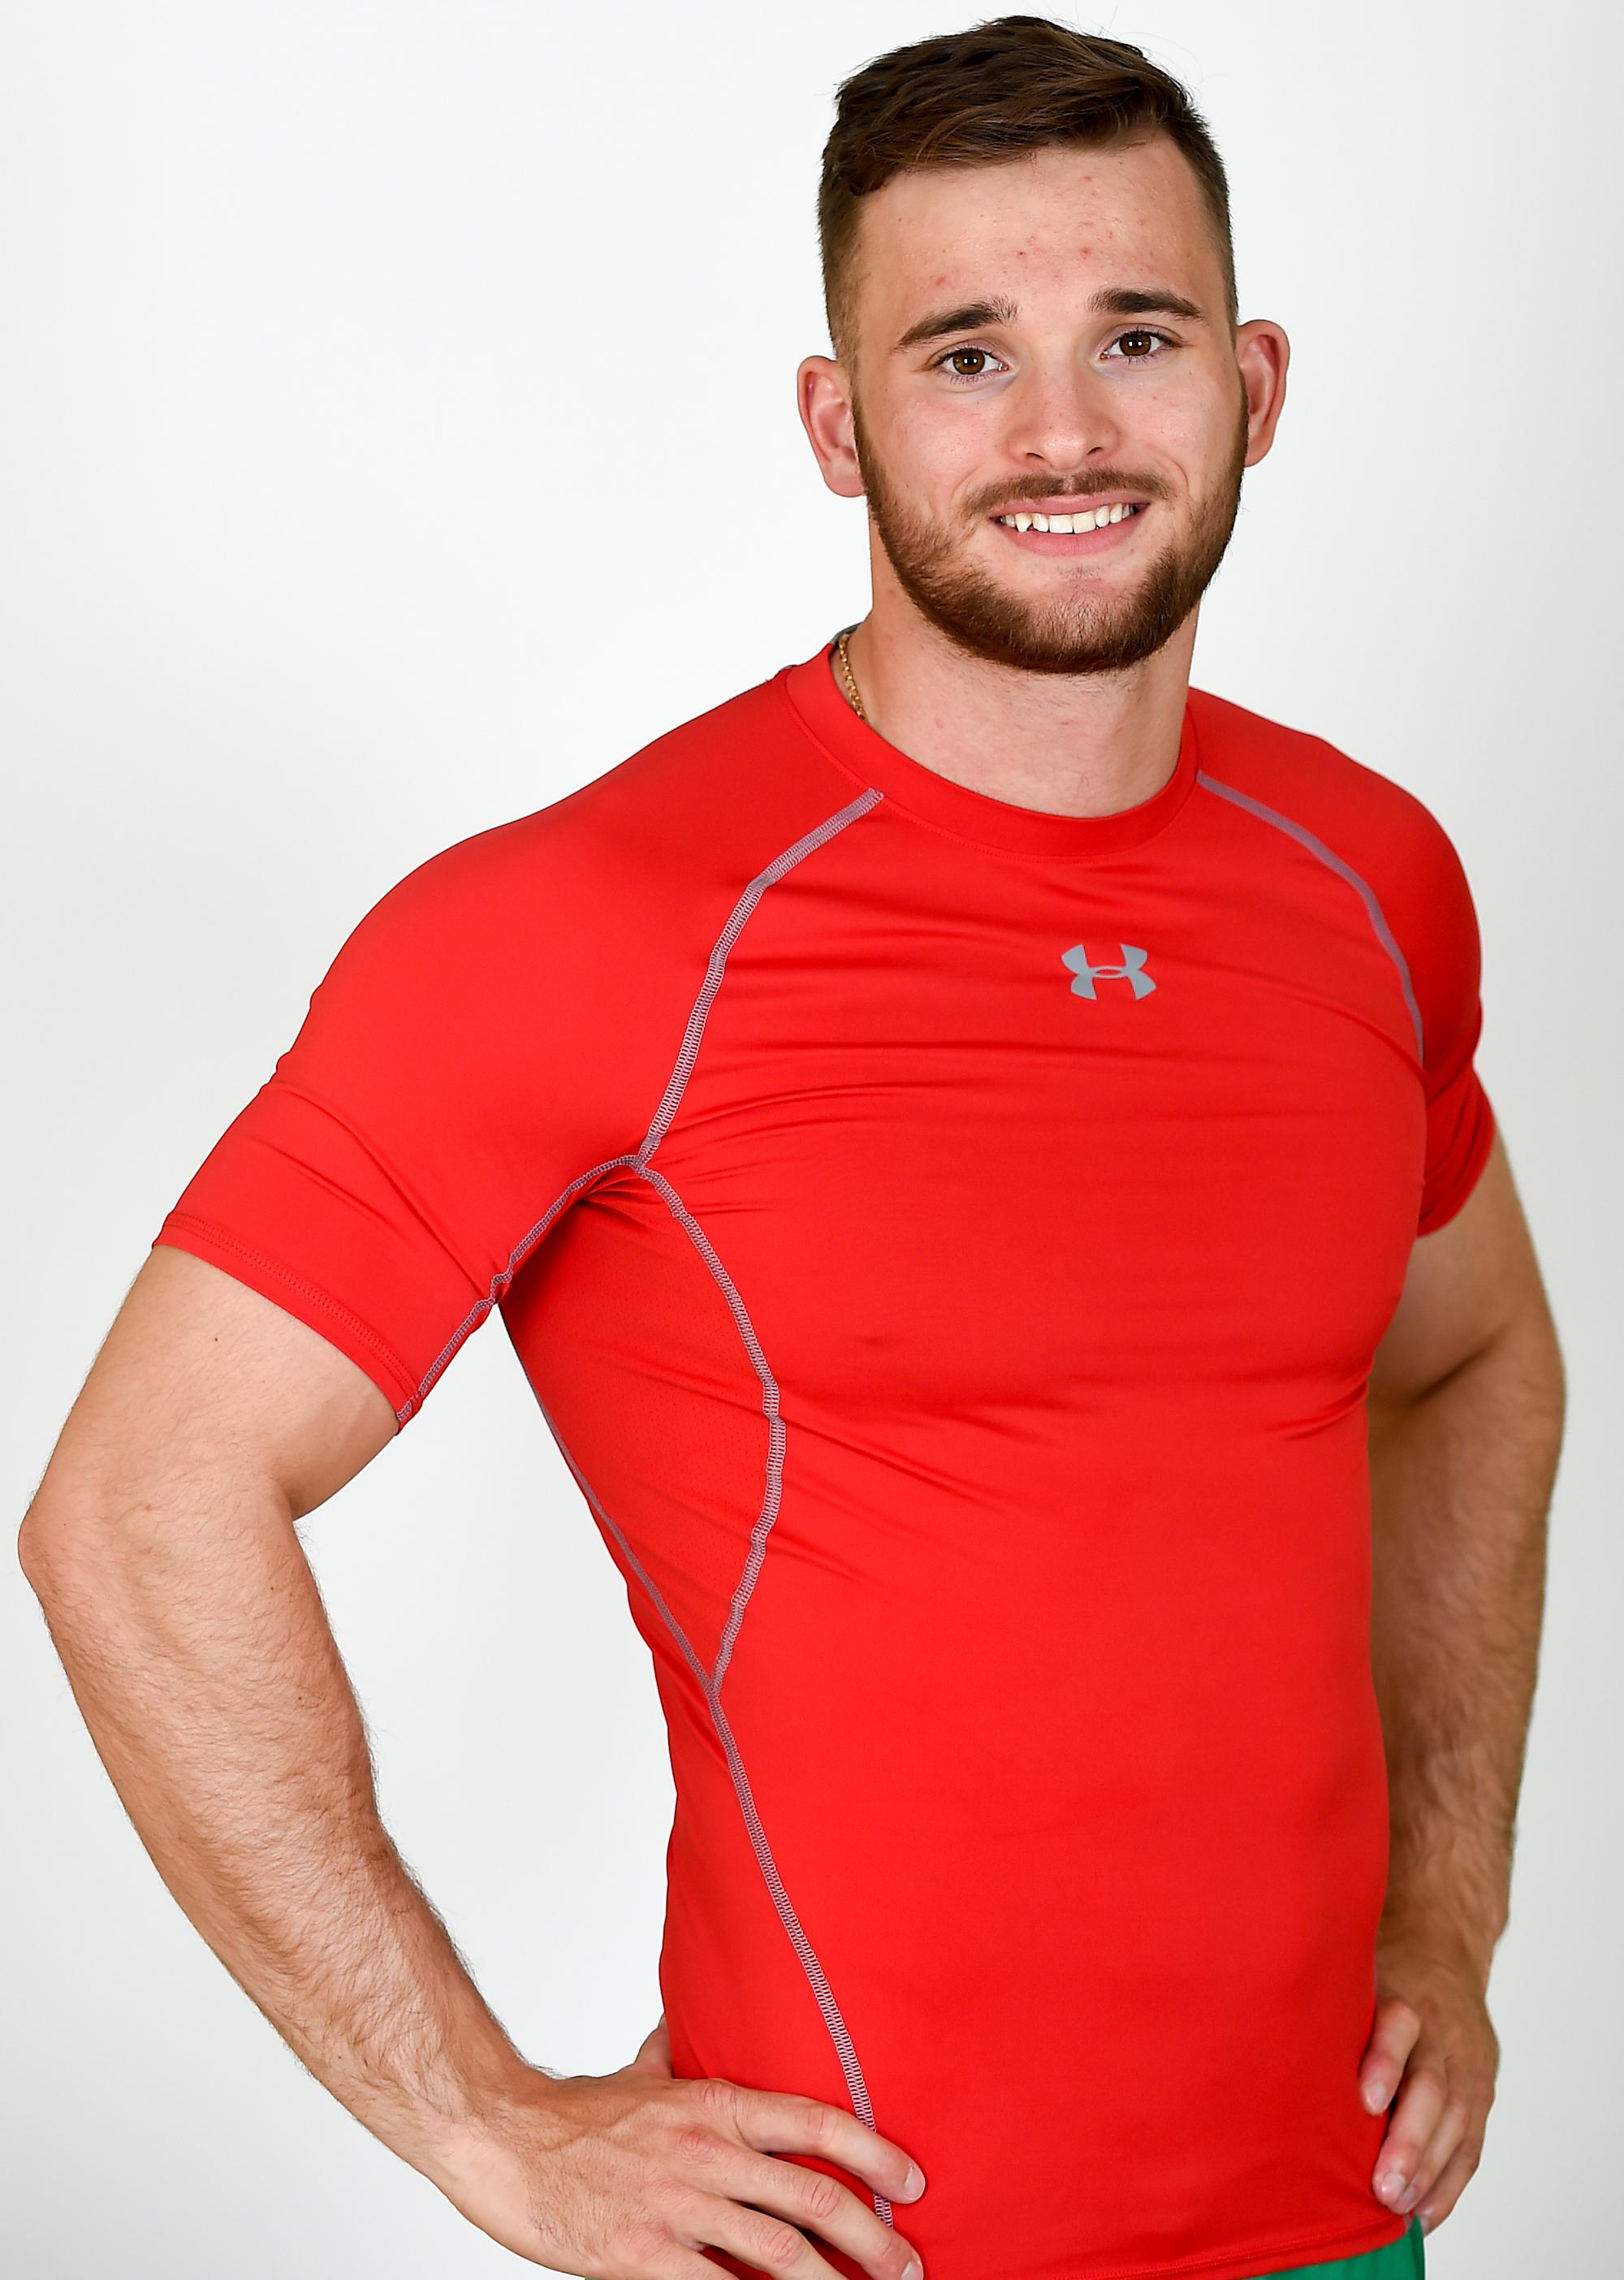 Rio 2016 - Birkás Balázs